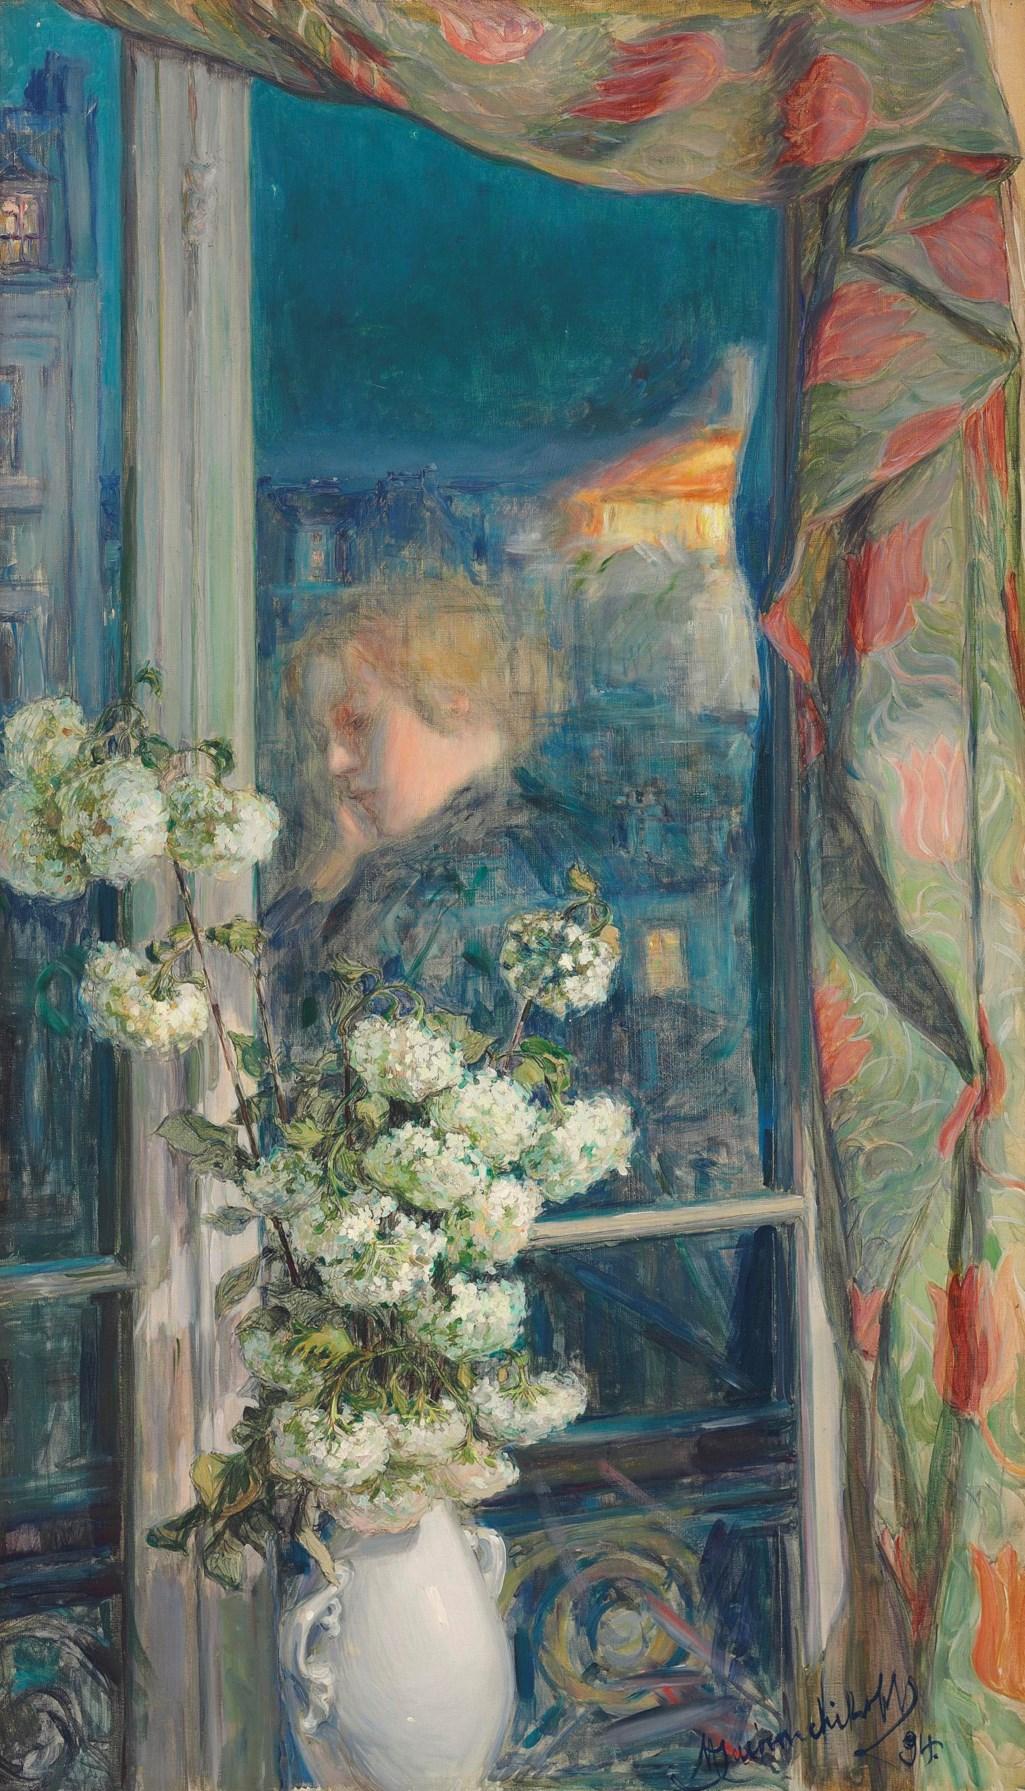 Maria Iakunchikova (1870-1902) Reflection of an intimate world